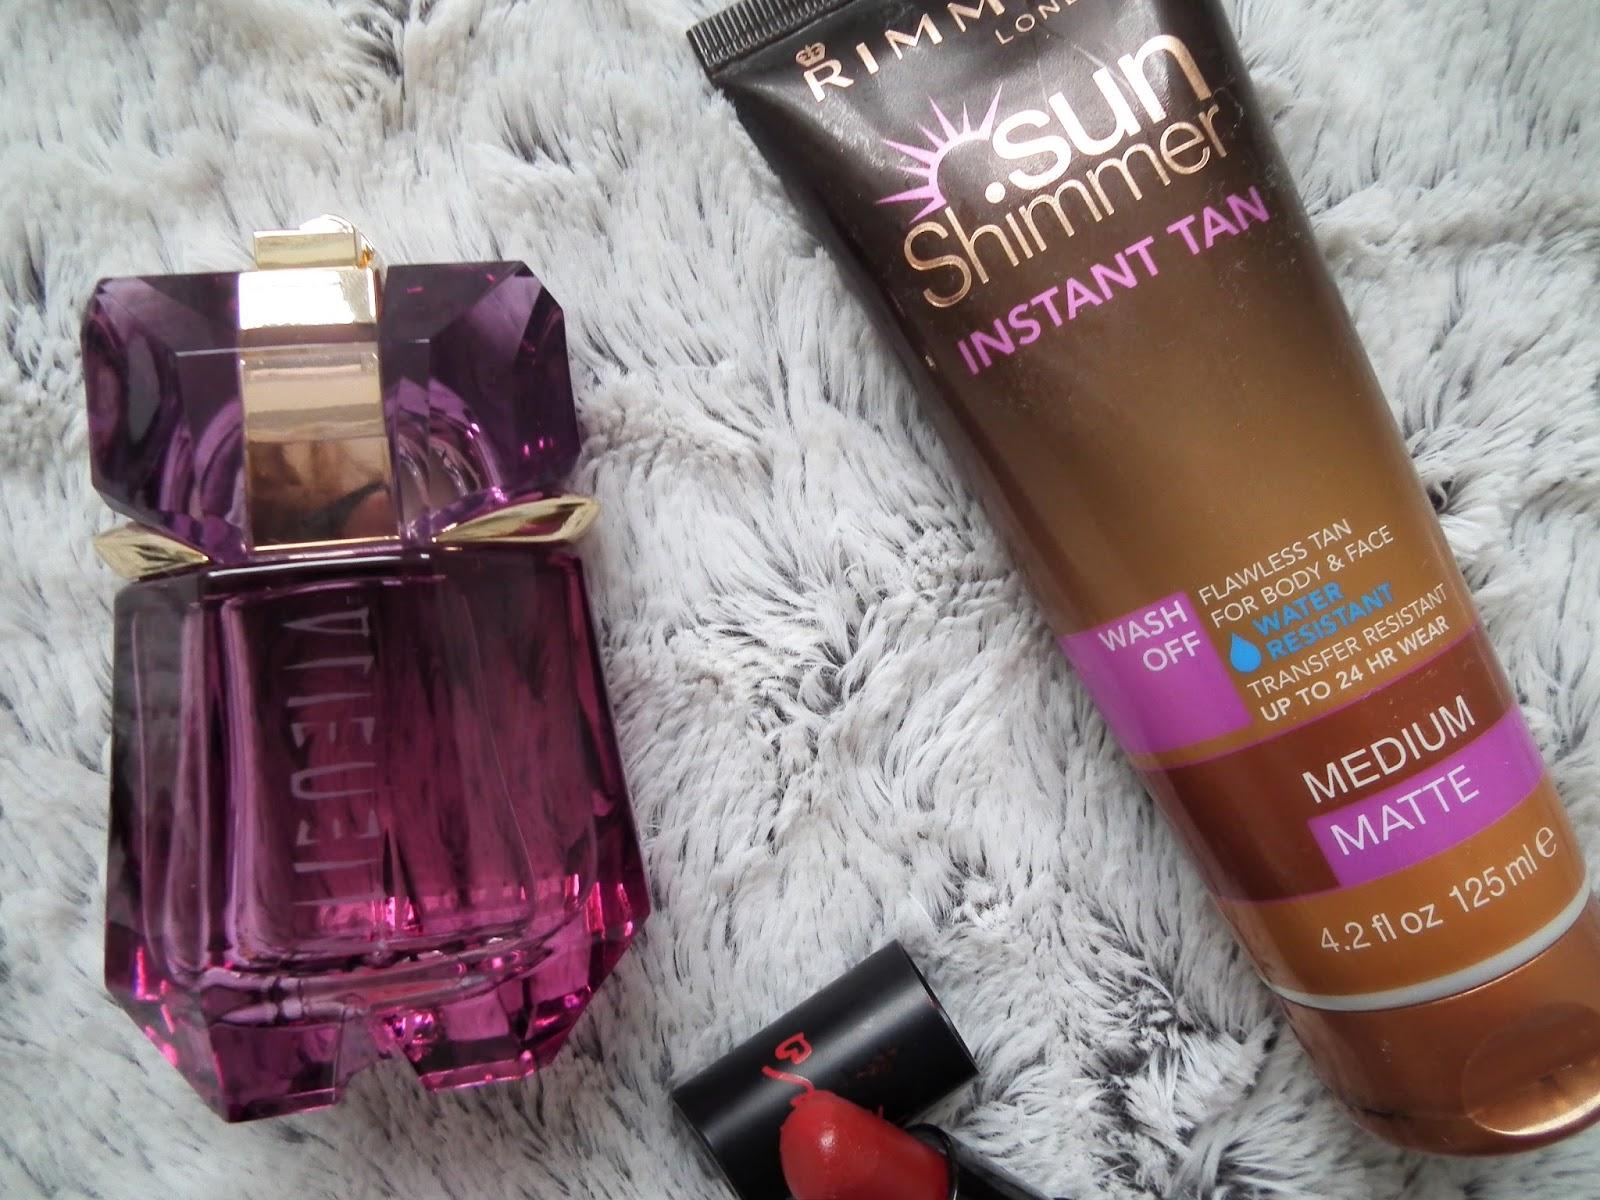 Perfume & Instant Tan